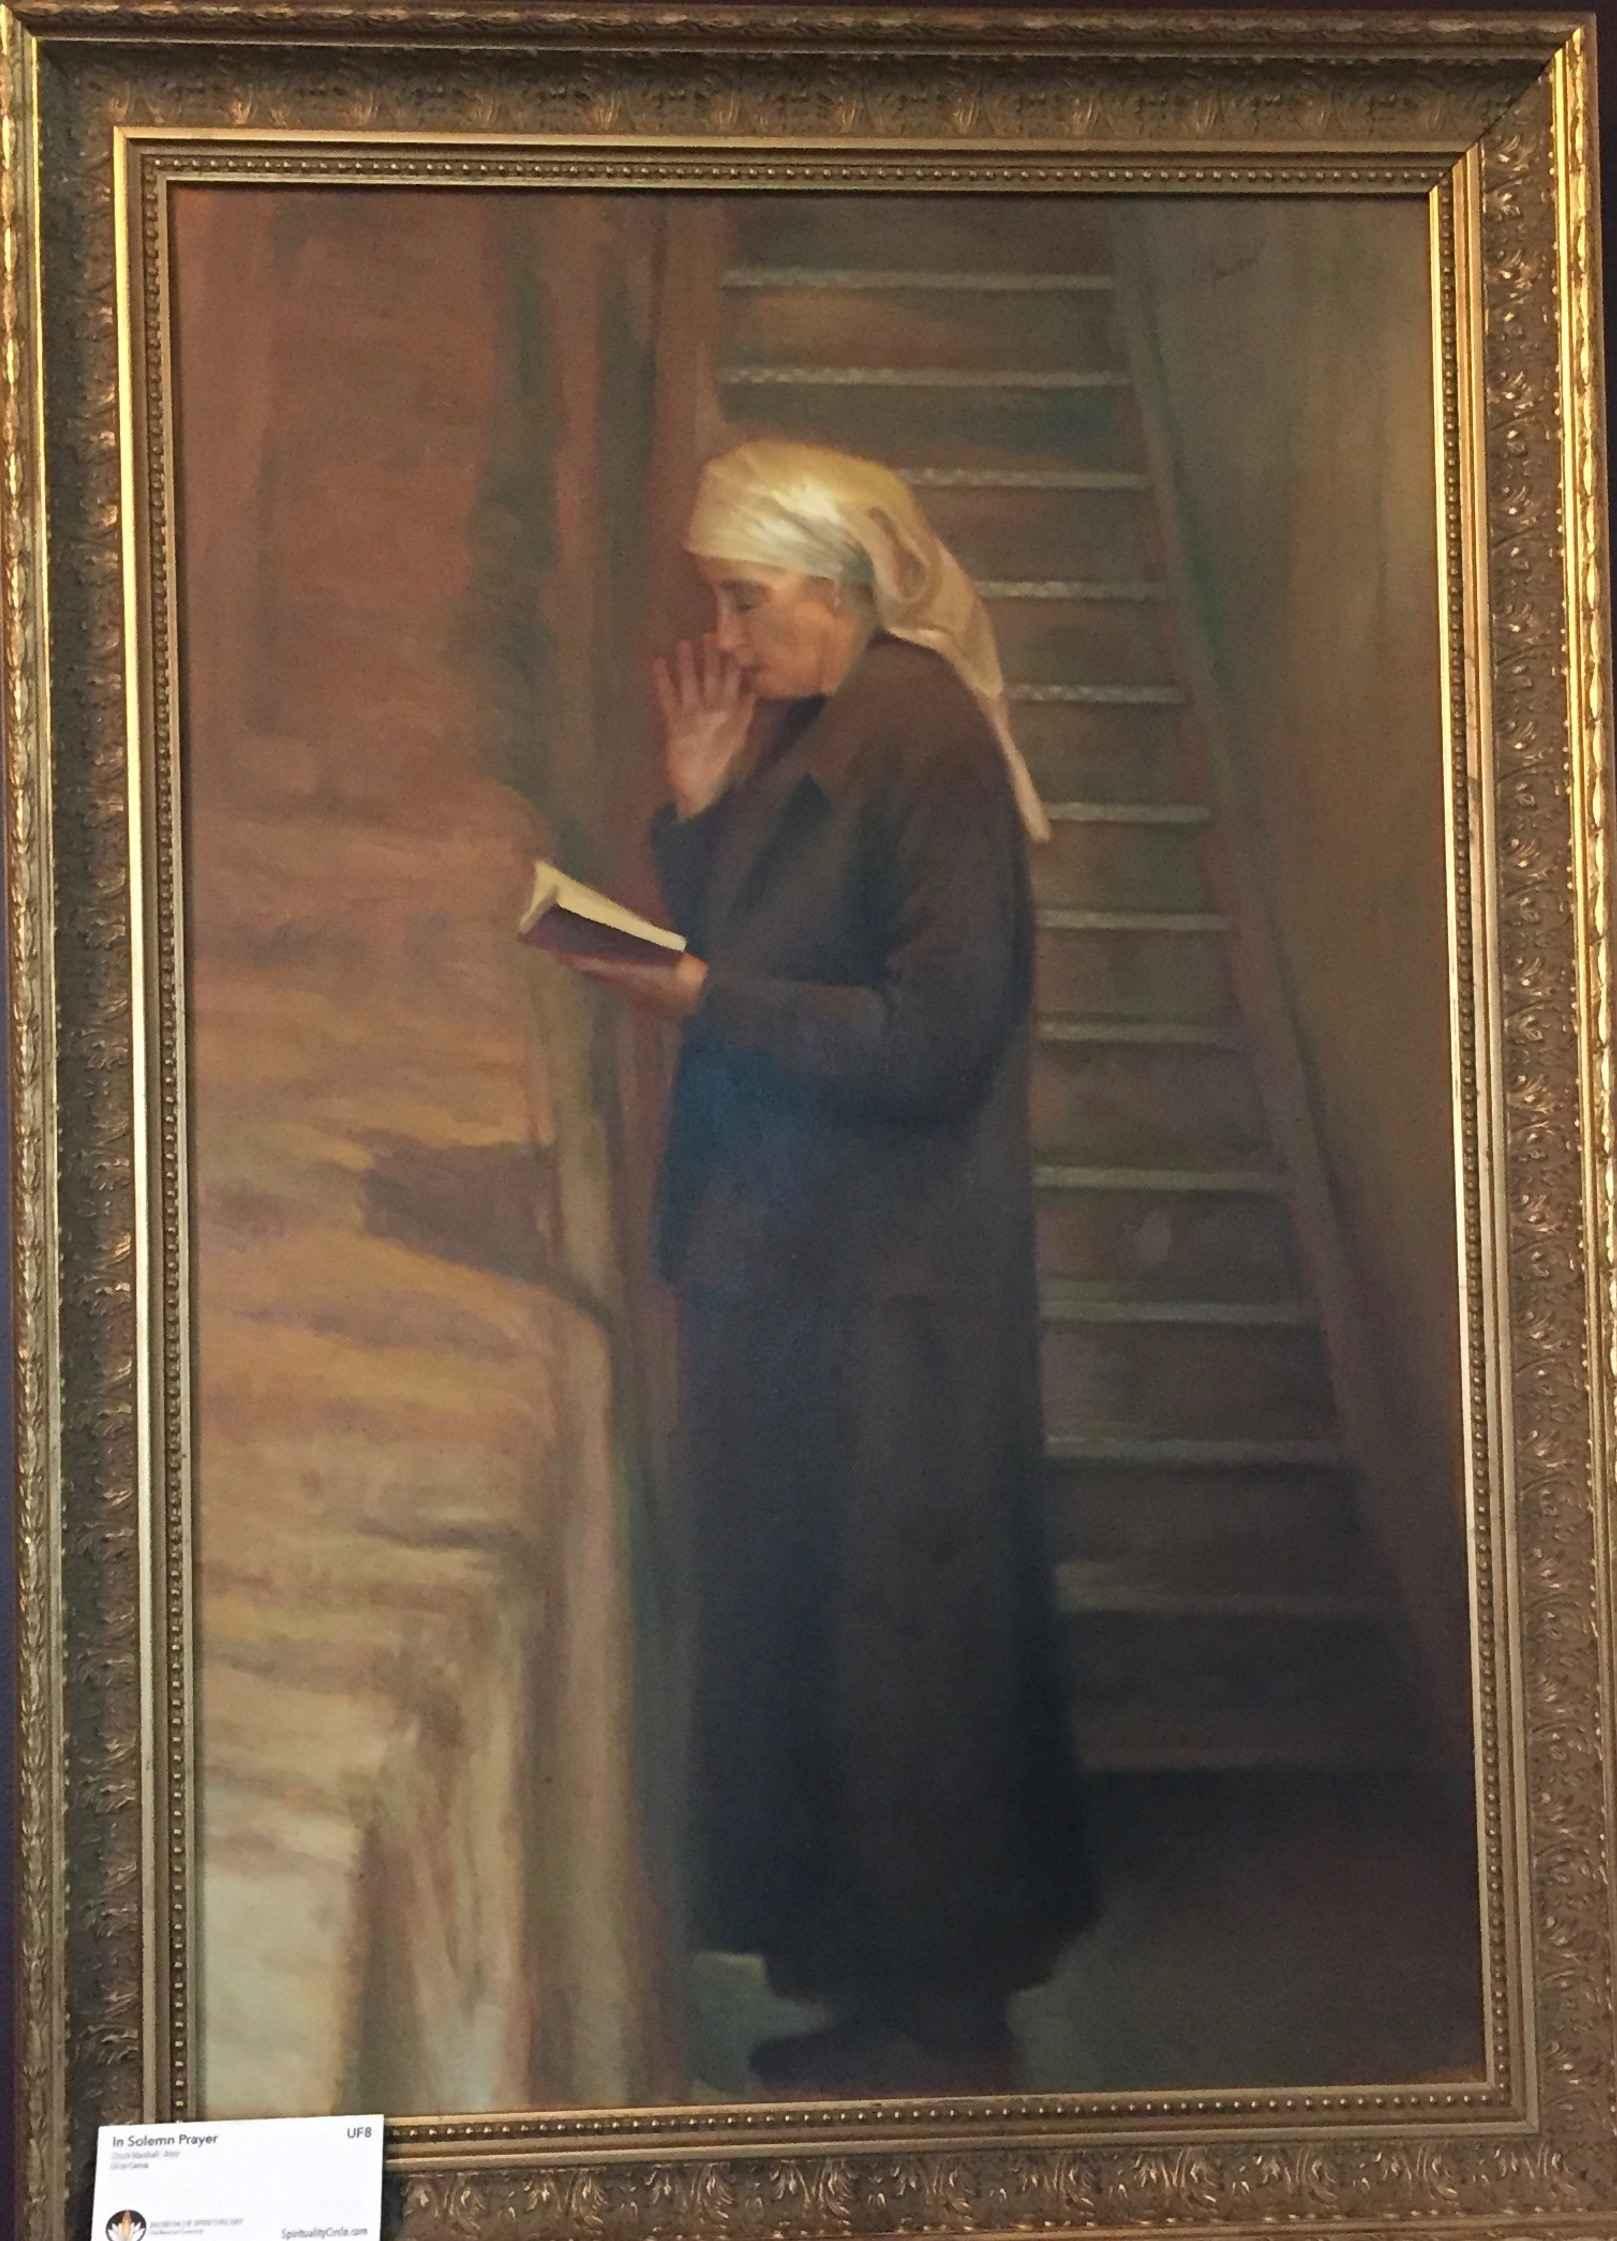 The Solemn Prayer by  Chuck Marshall - Masterpiece Online